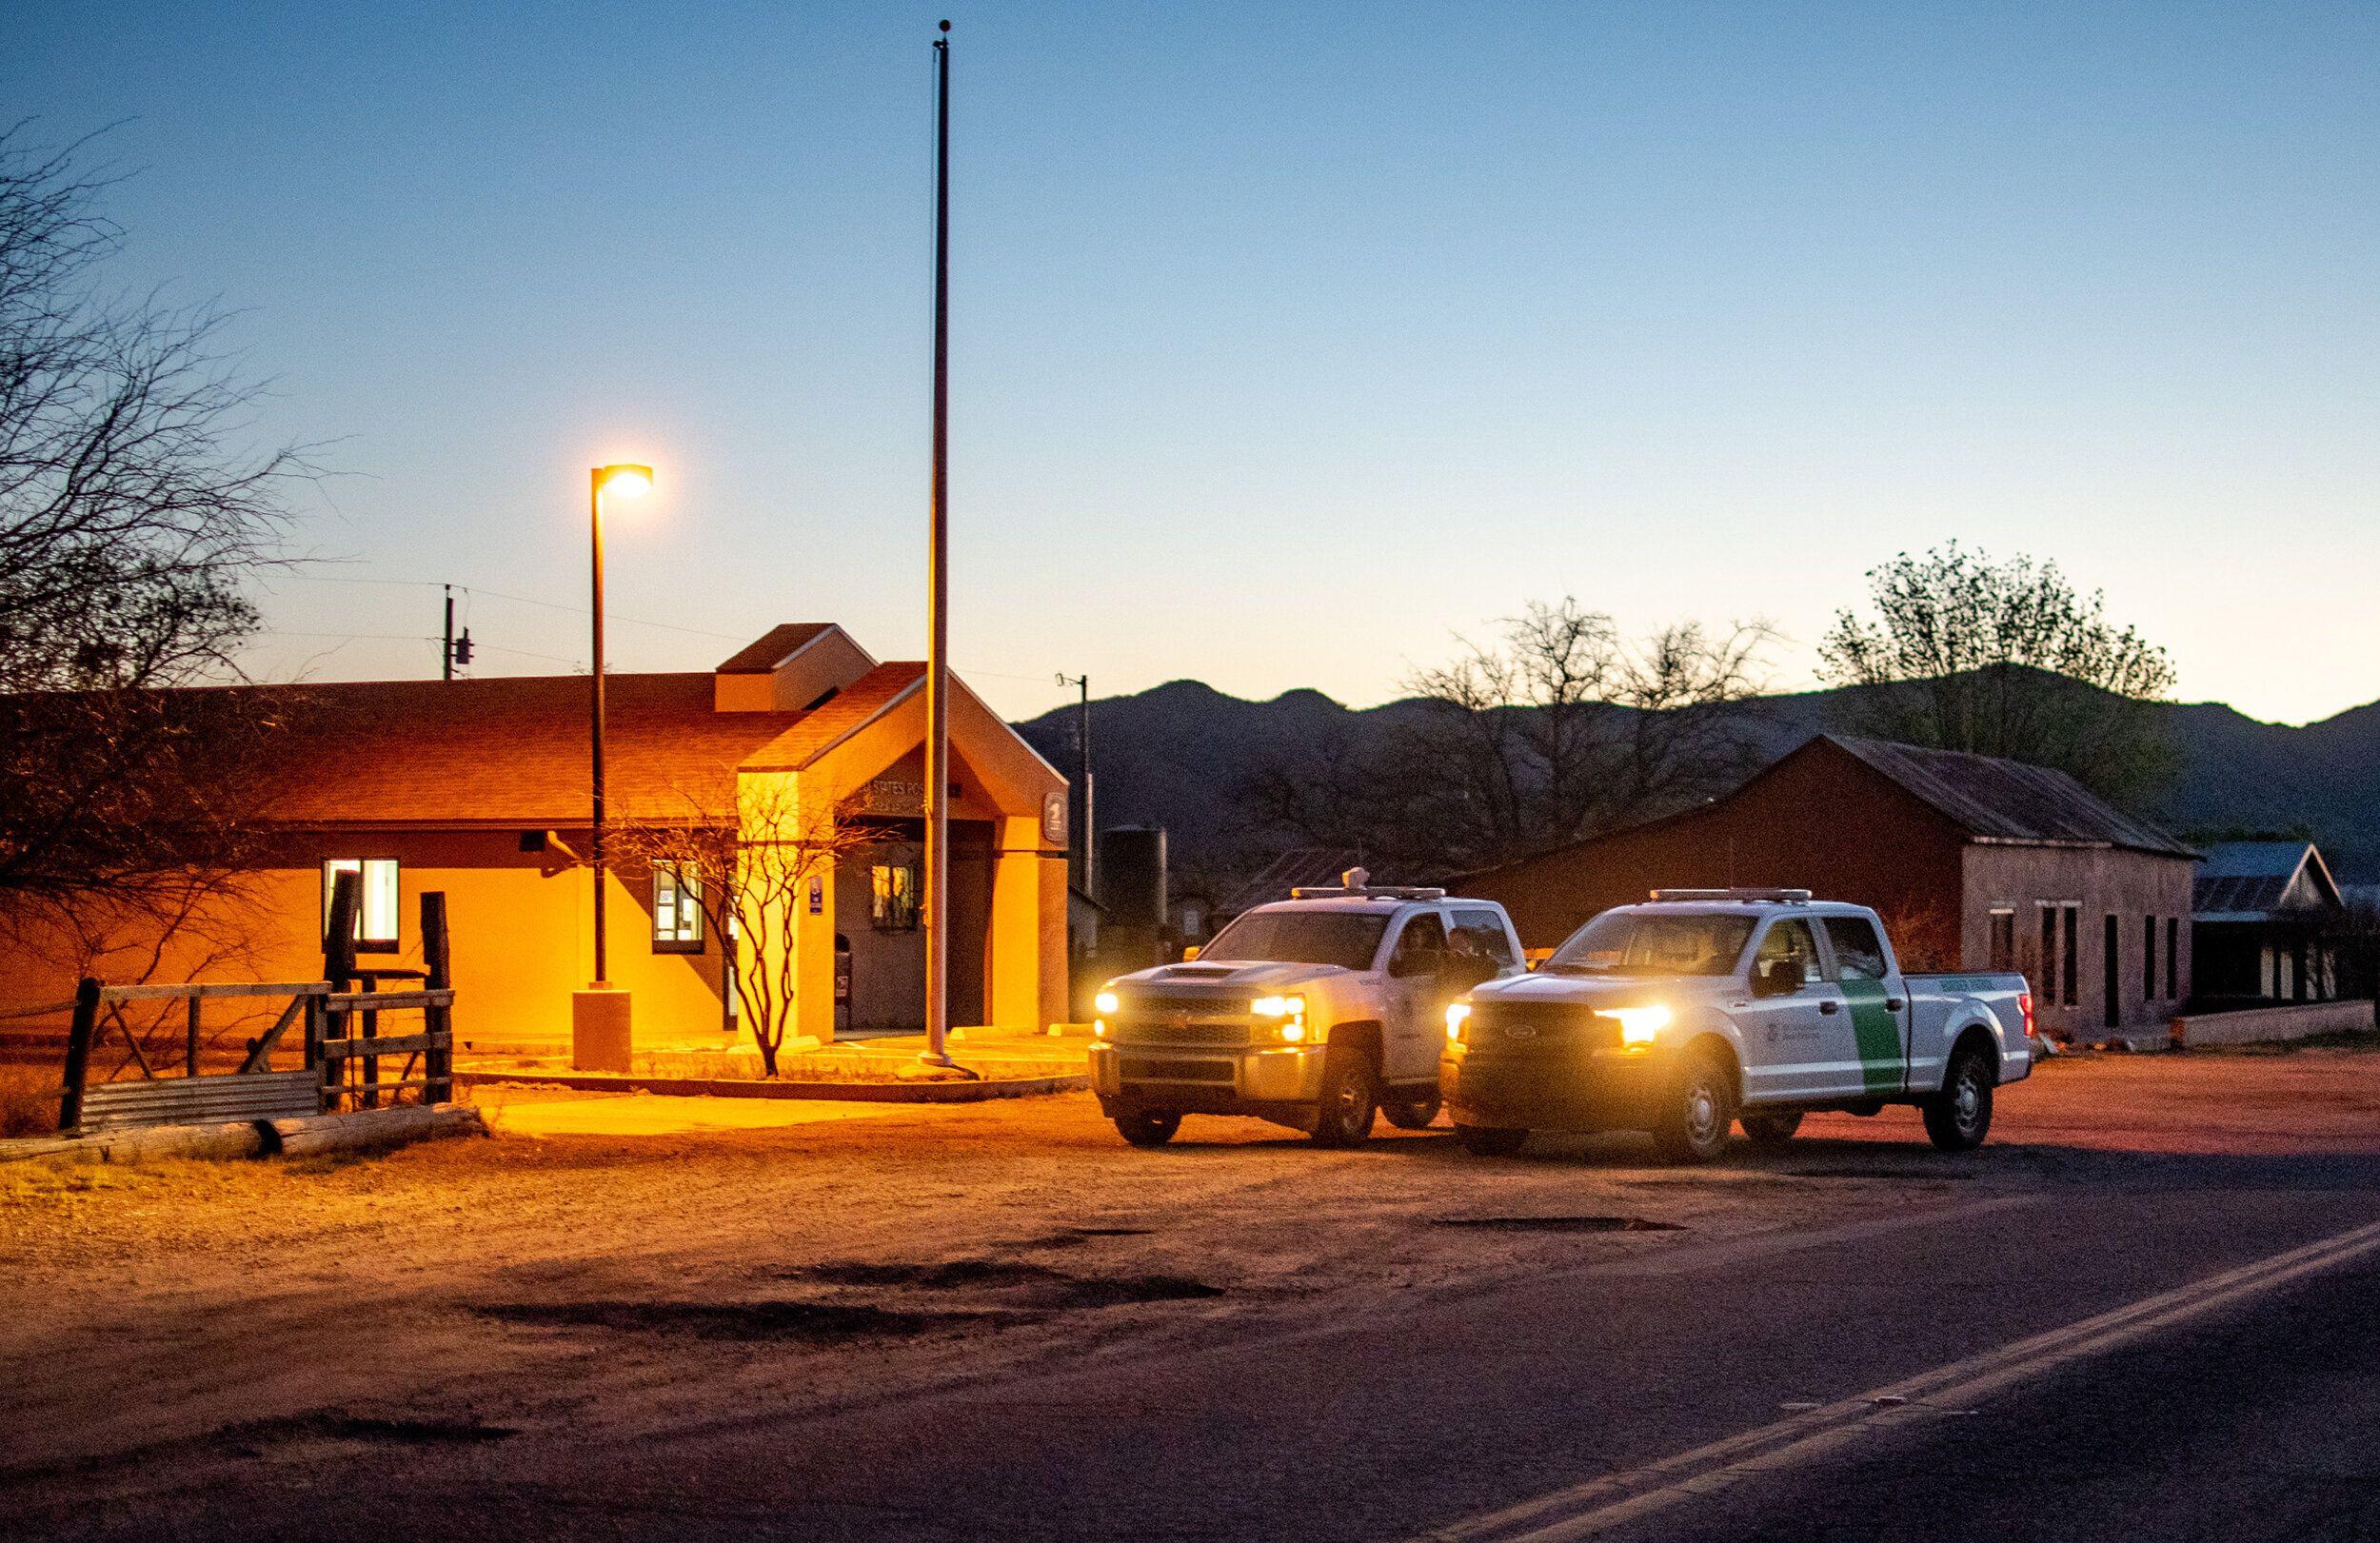 U.S. Border Patrol trucks sit parked on the main road in Arivaca on April 15.